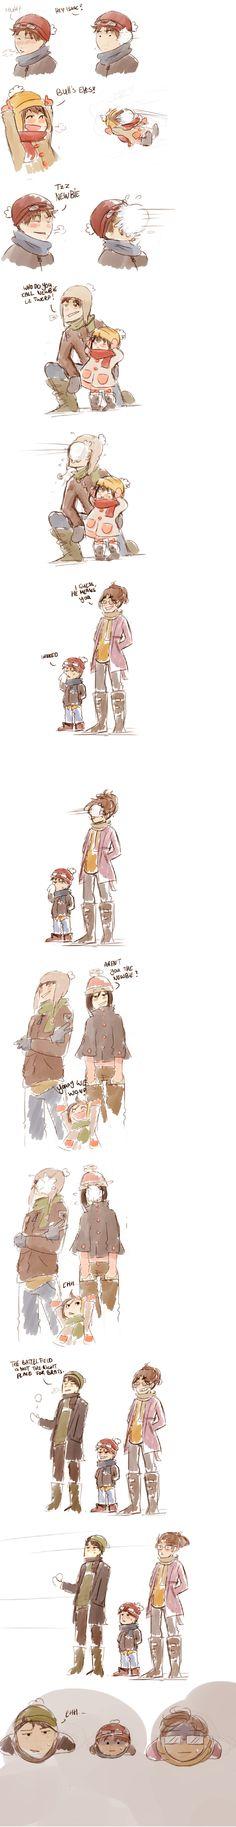 Eren x Mikasa & Levi x Hanji with their kids